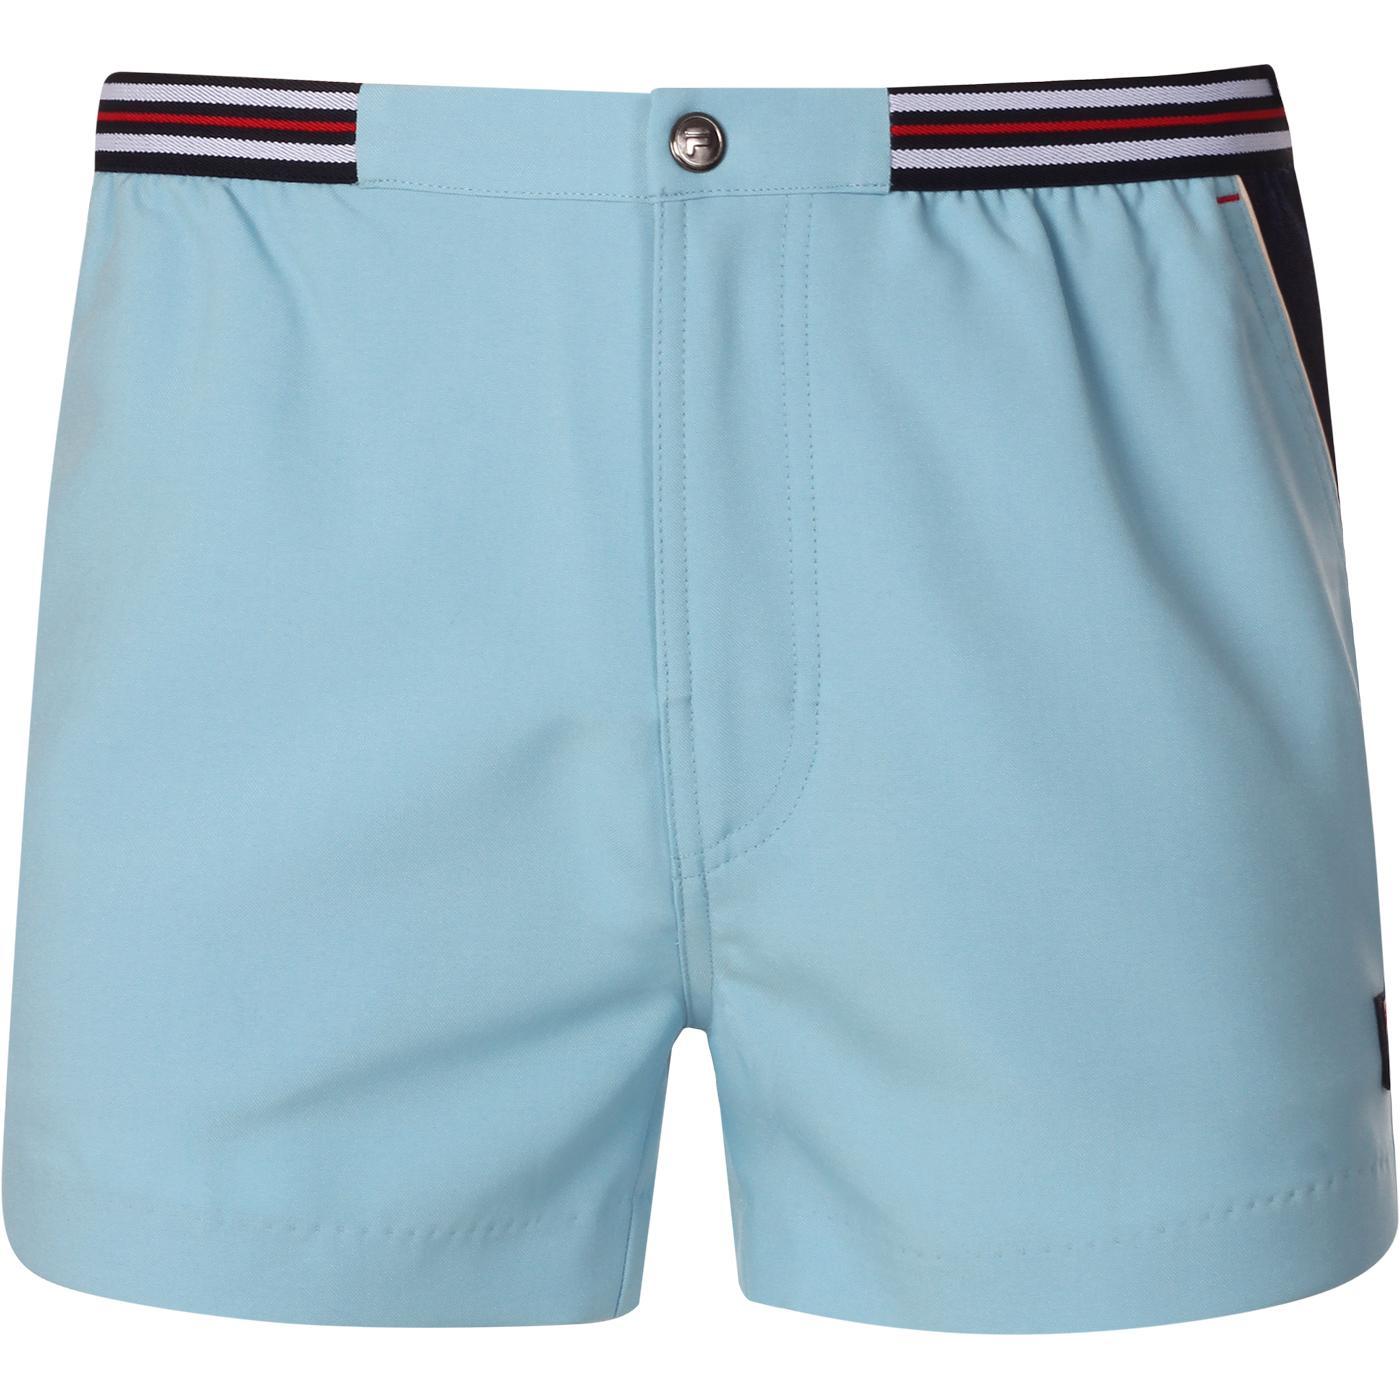 High Tide 4 FILA VINTAGE Retro 70s Tennis Shorts A